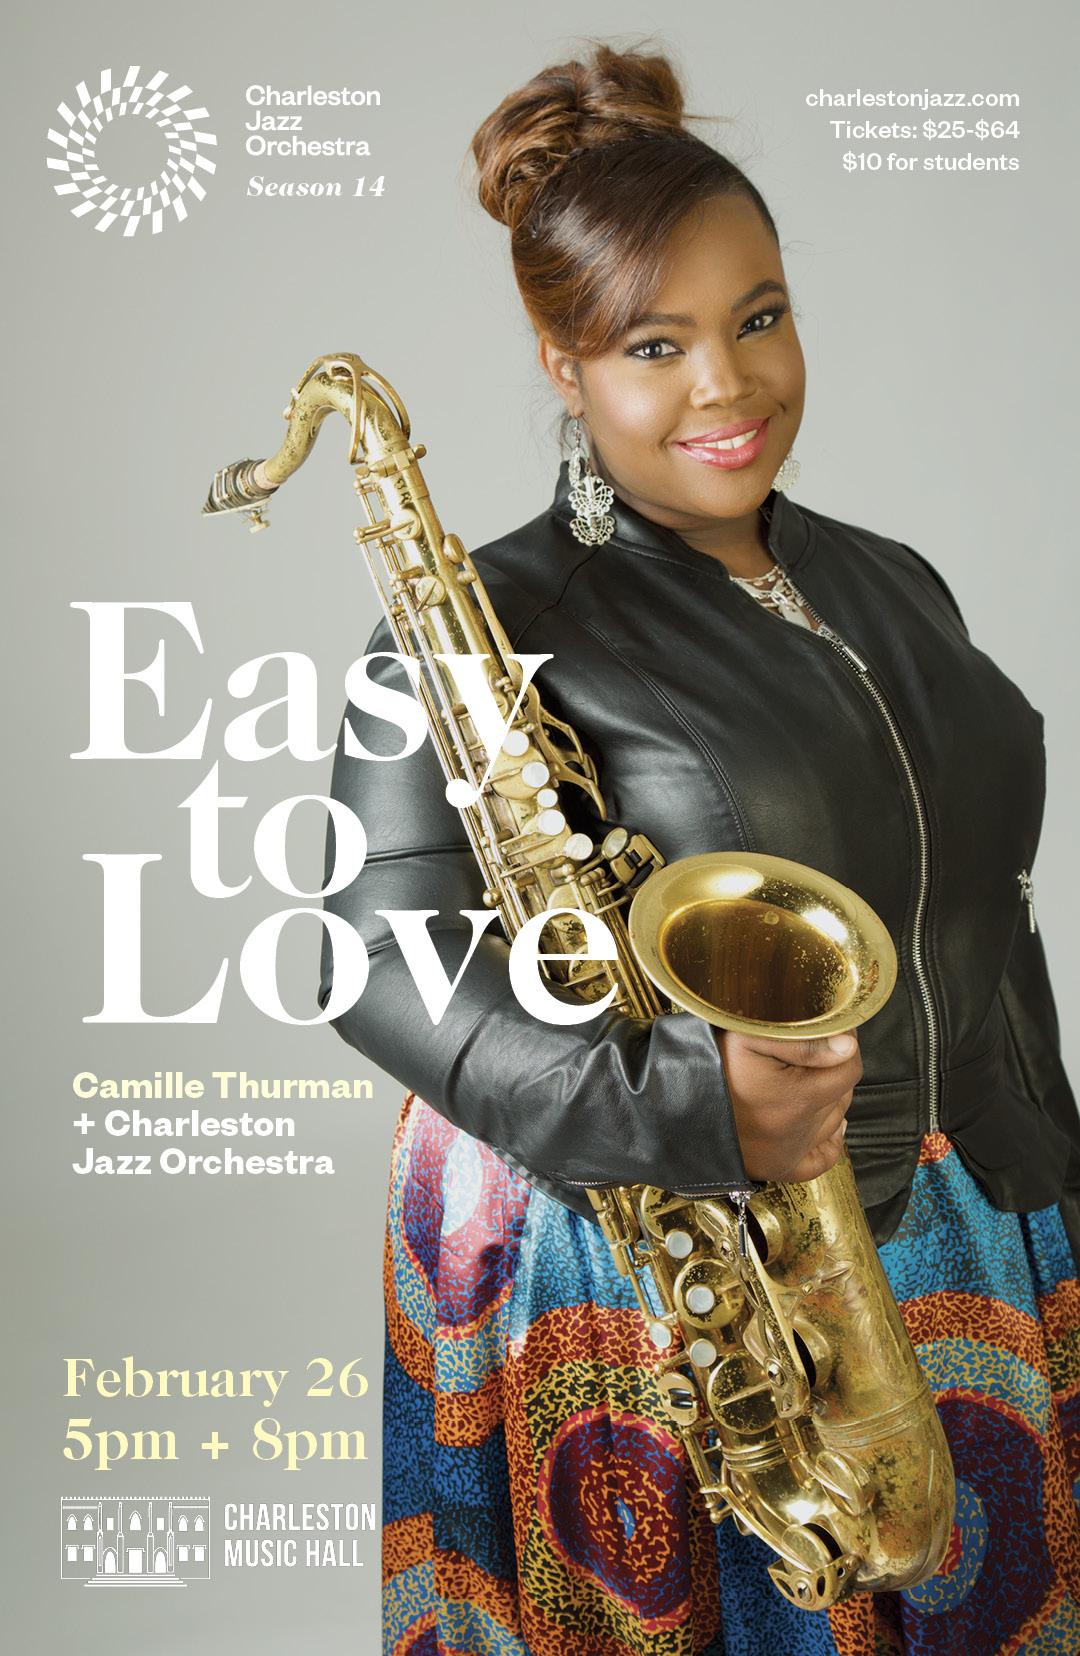 CJO Season 14 - Easy to Love